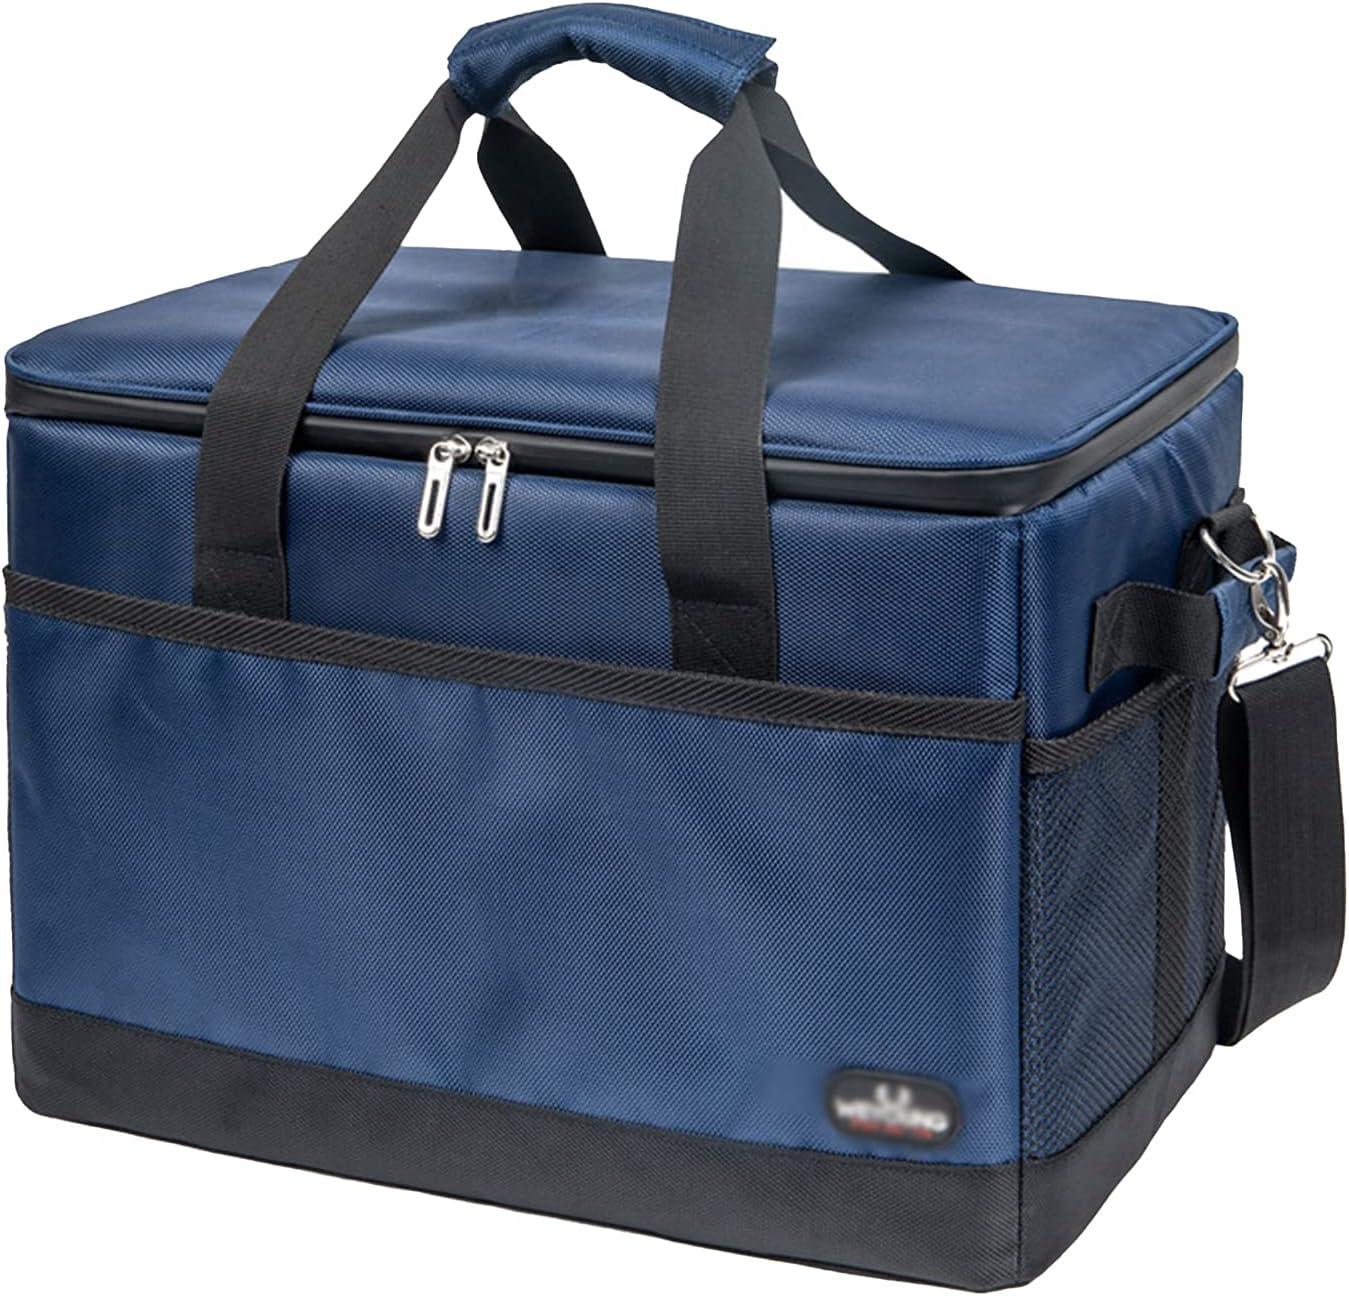 DGHD Picnic Max 67% OFF Bag Large Capacity Outdoor Popular Portable Refr Camping